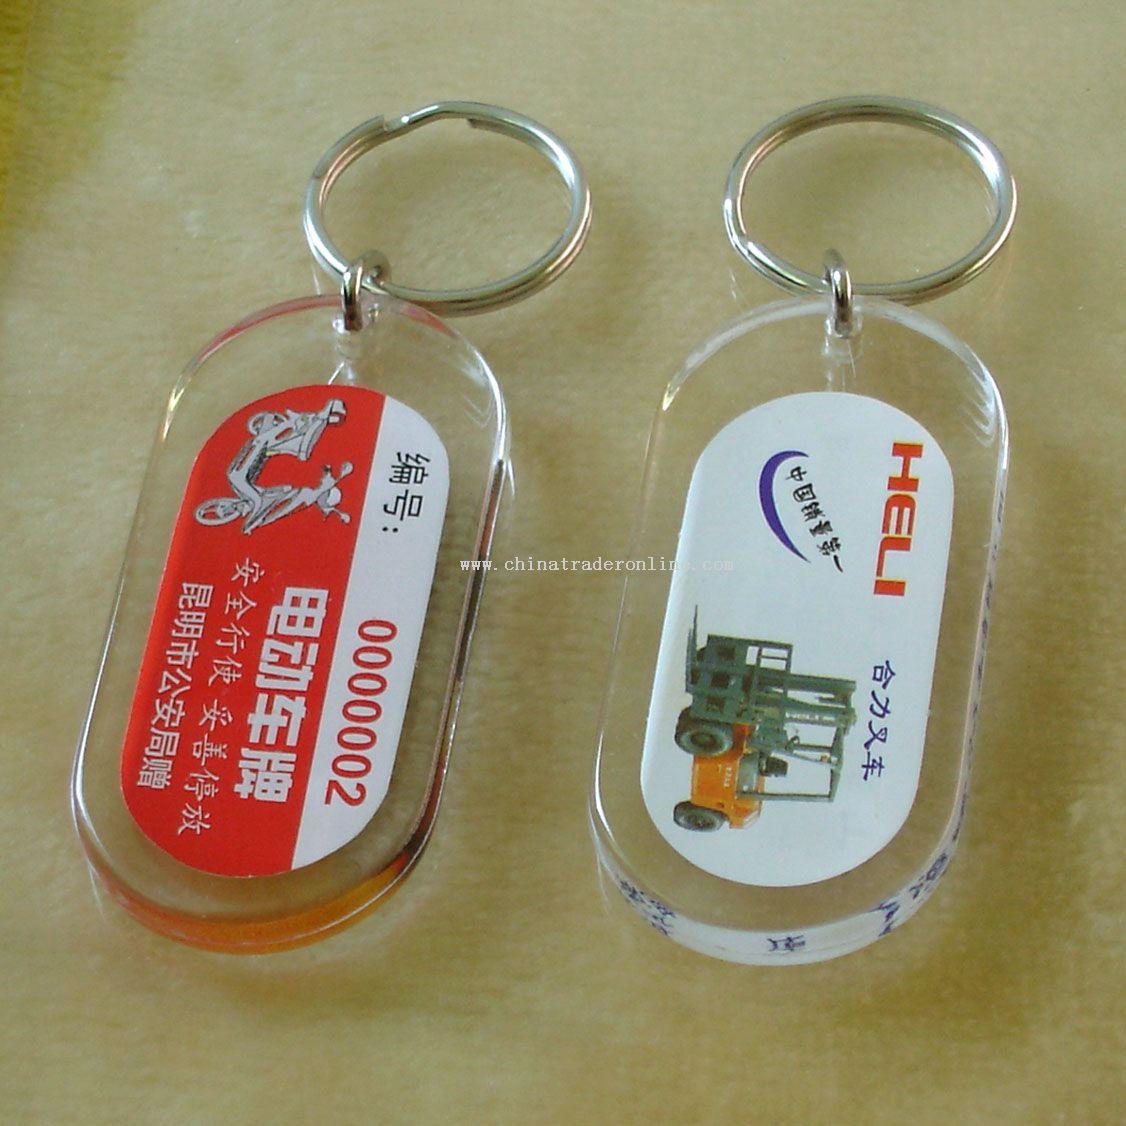 Acrylic solid keychain